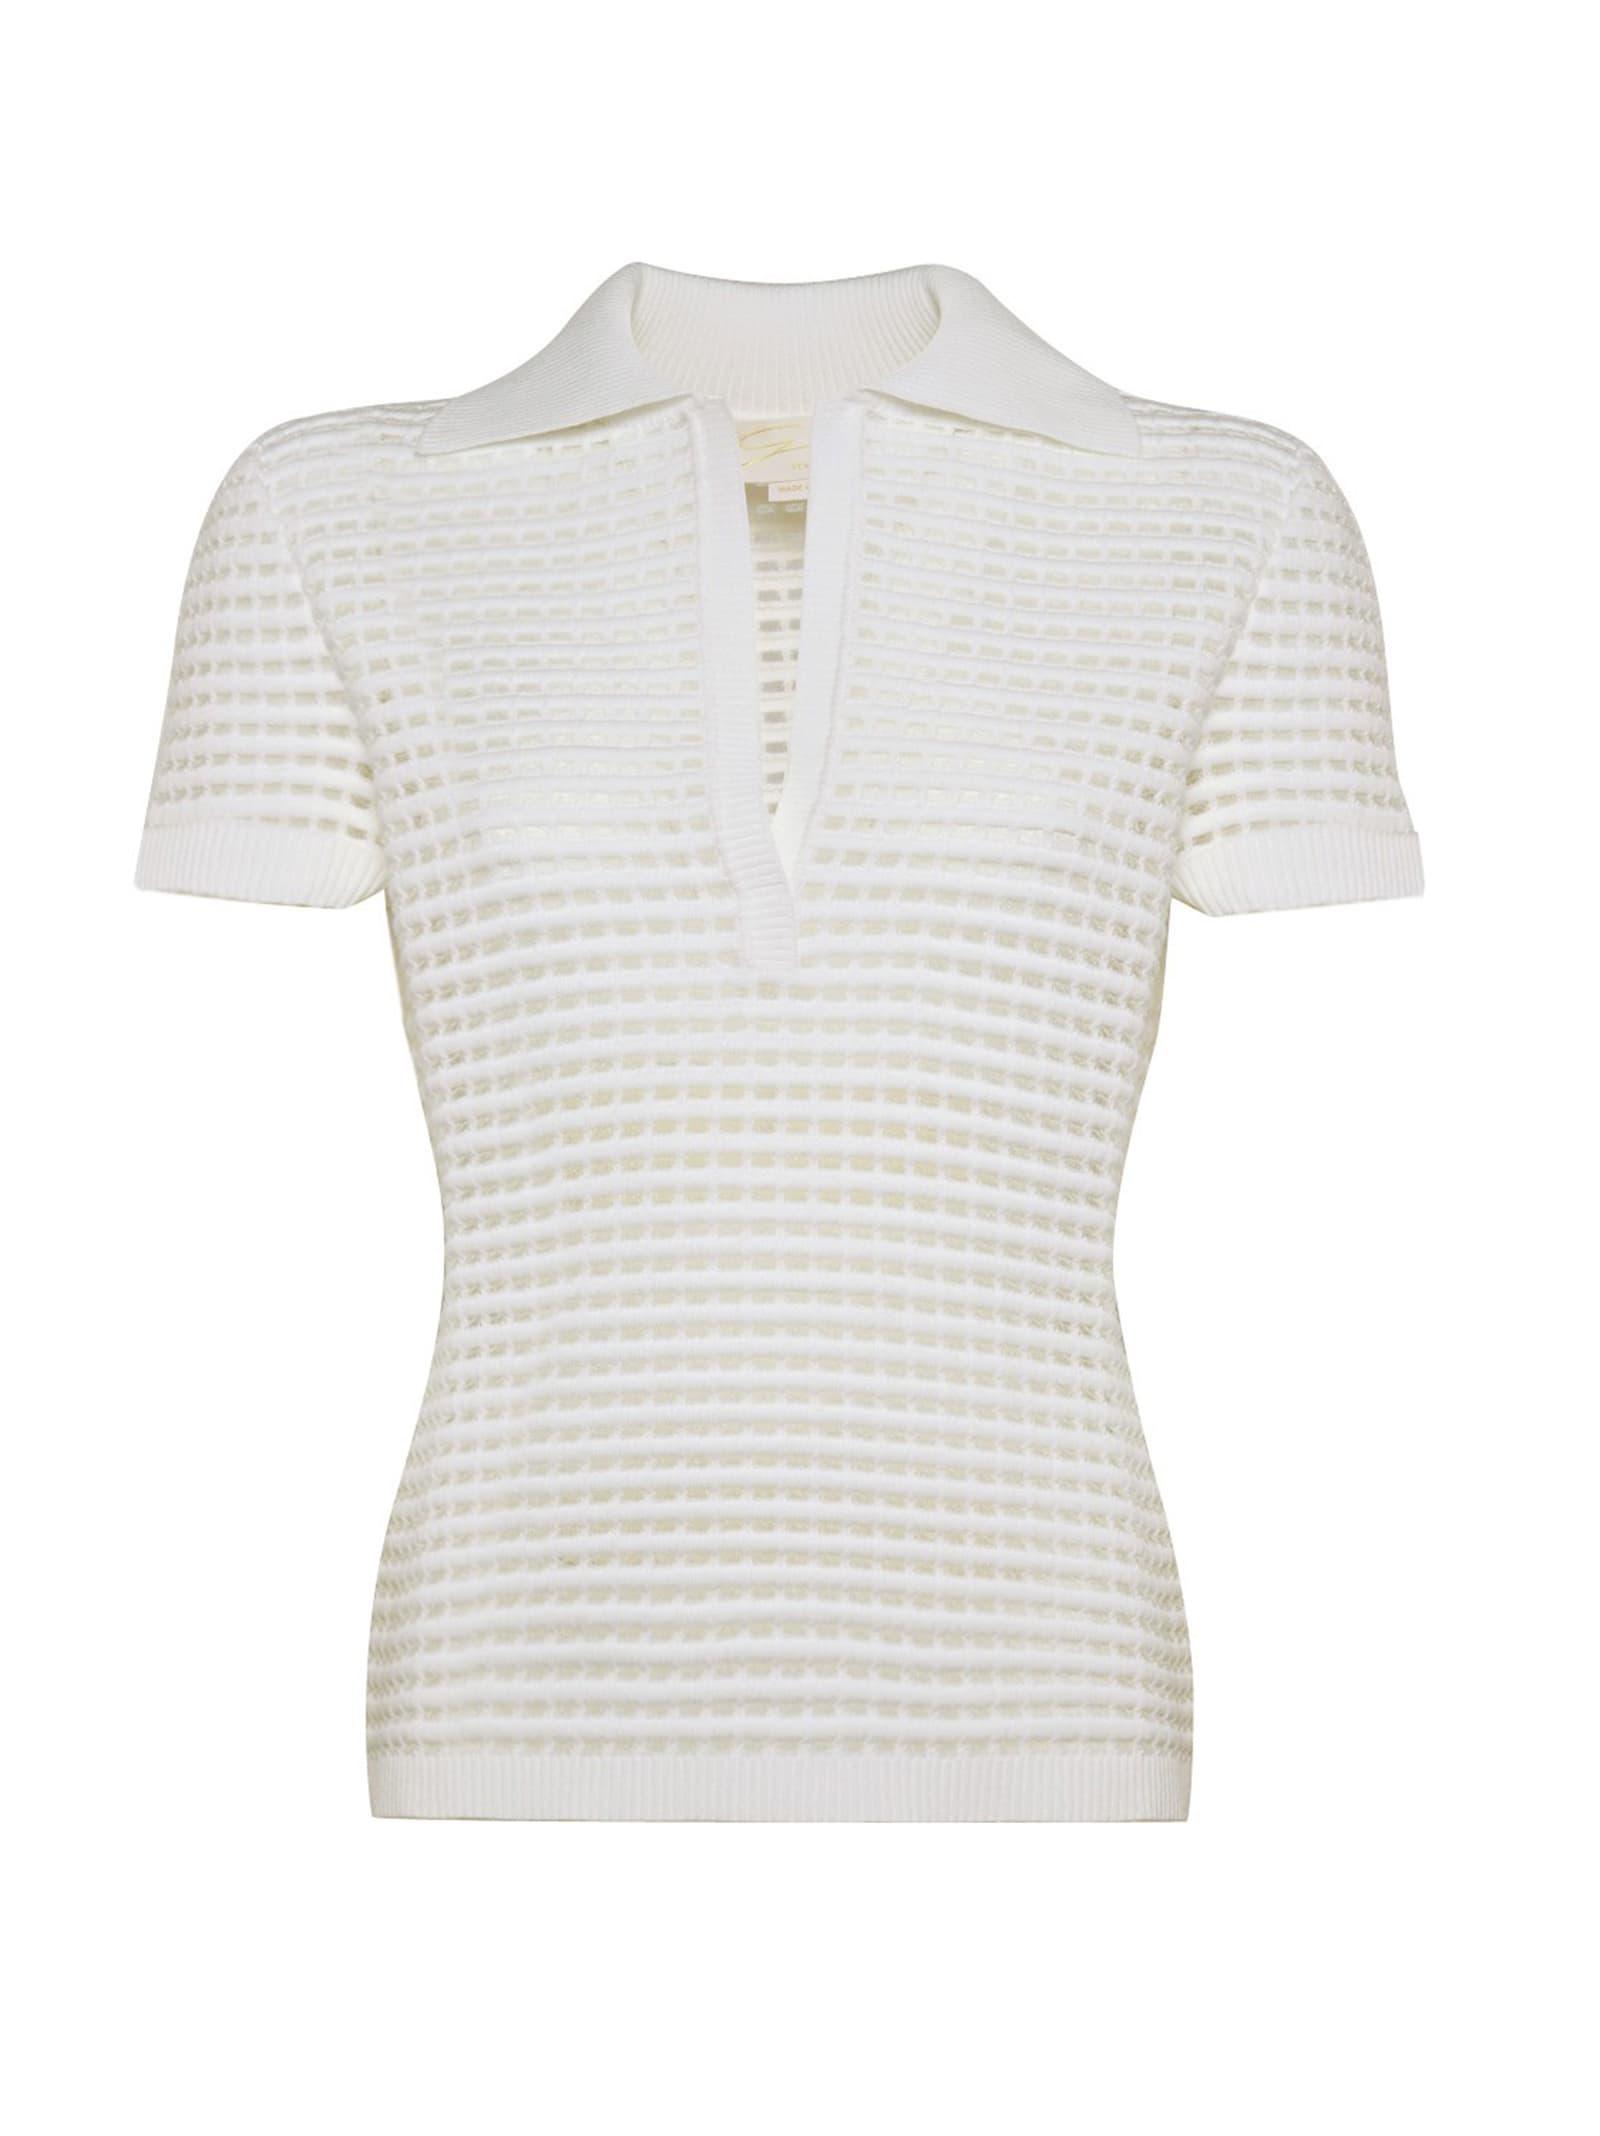 White Stretch-knit Top